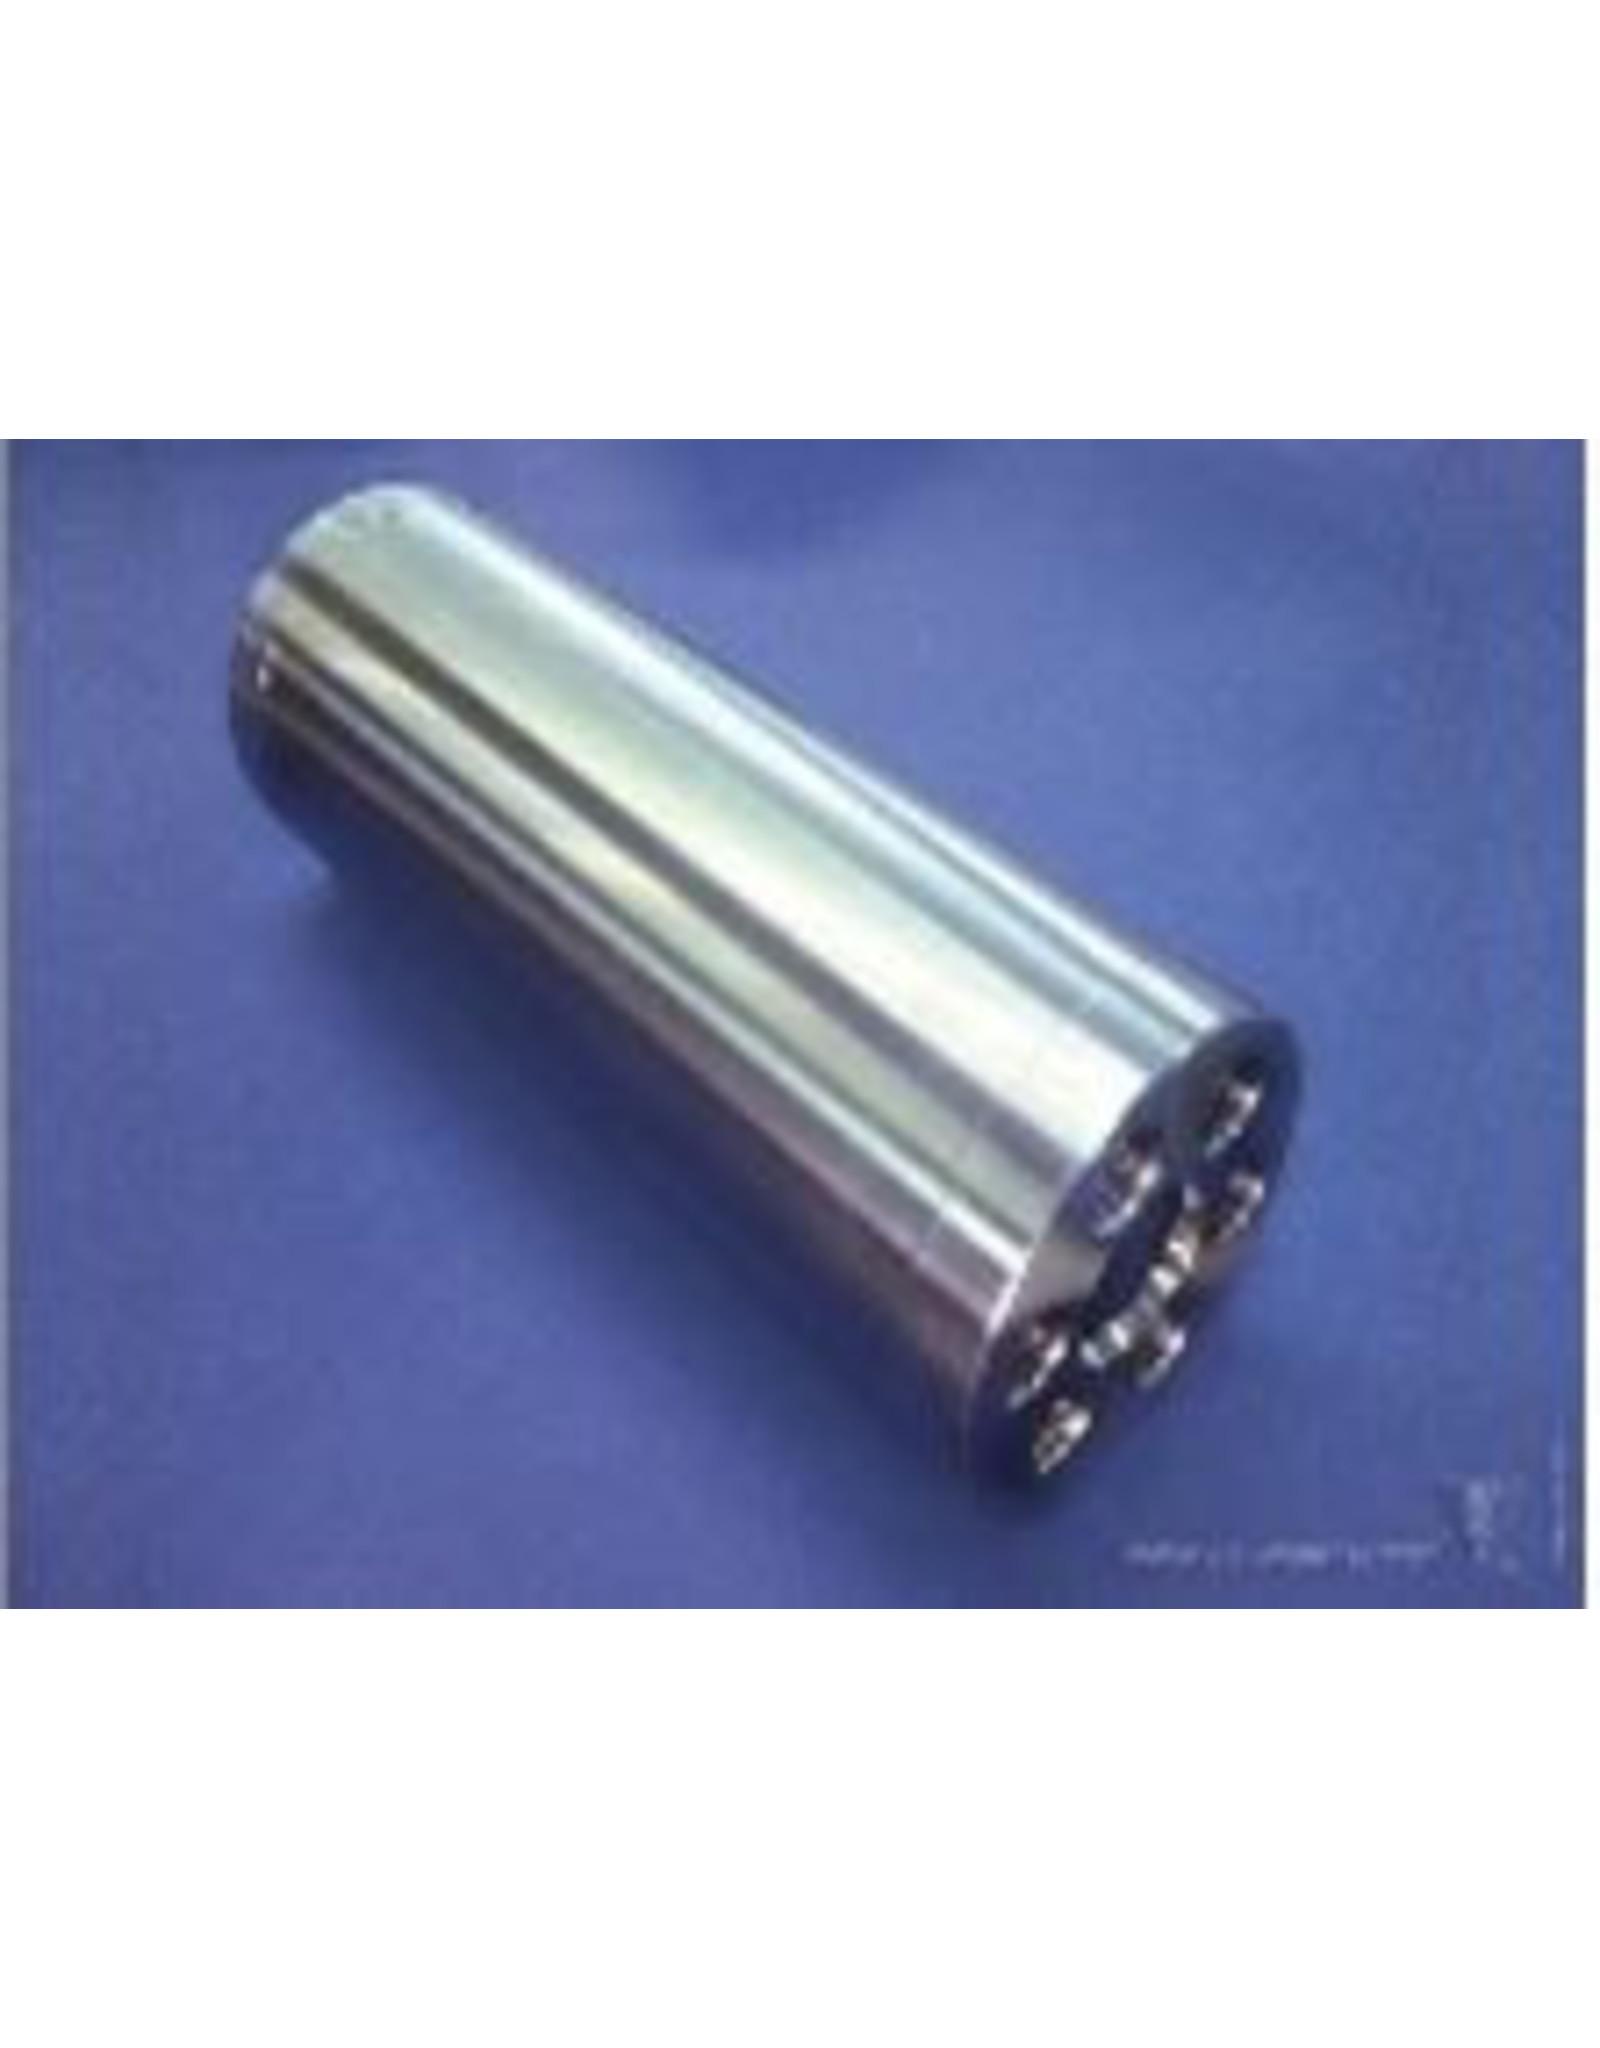 KMT Style Cylinder Body, IOC